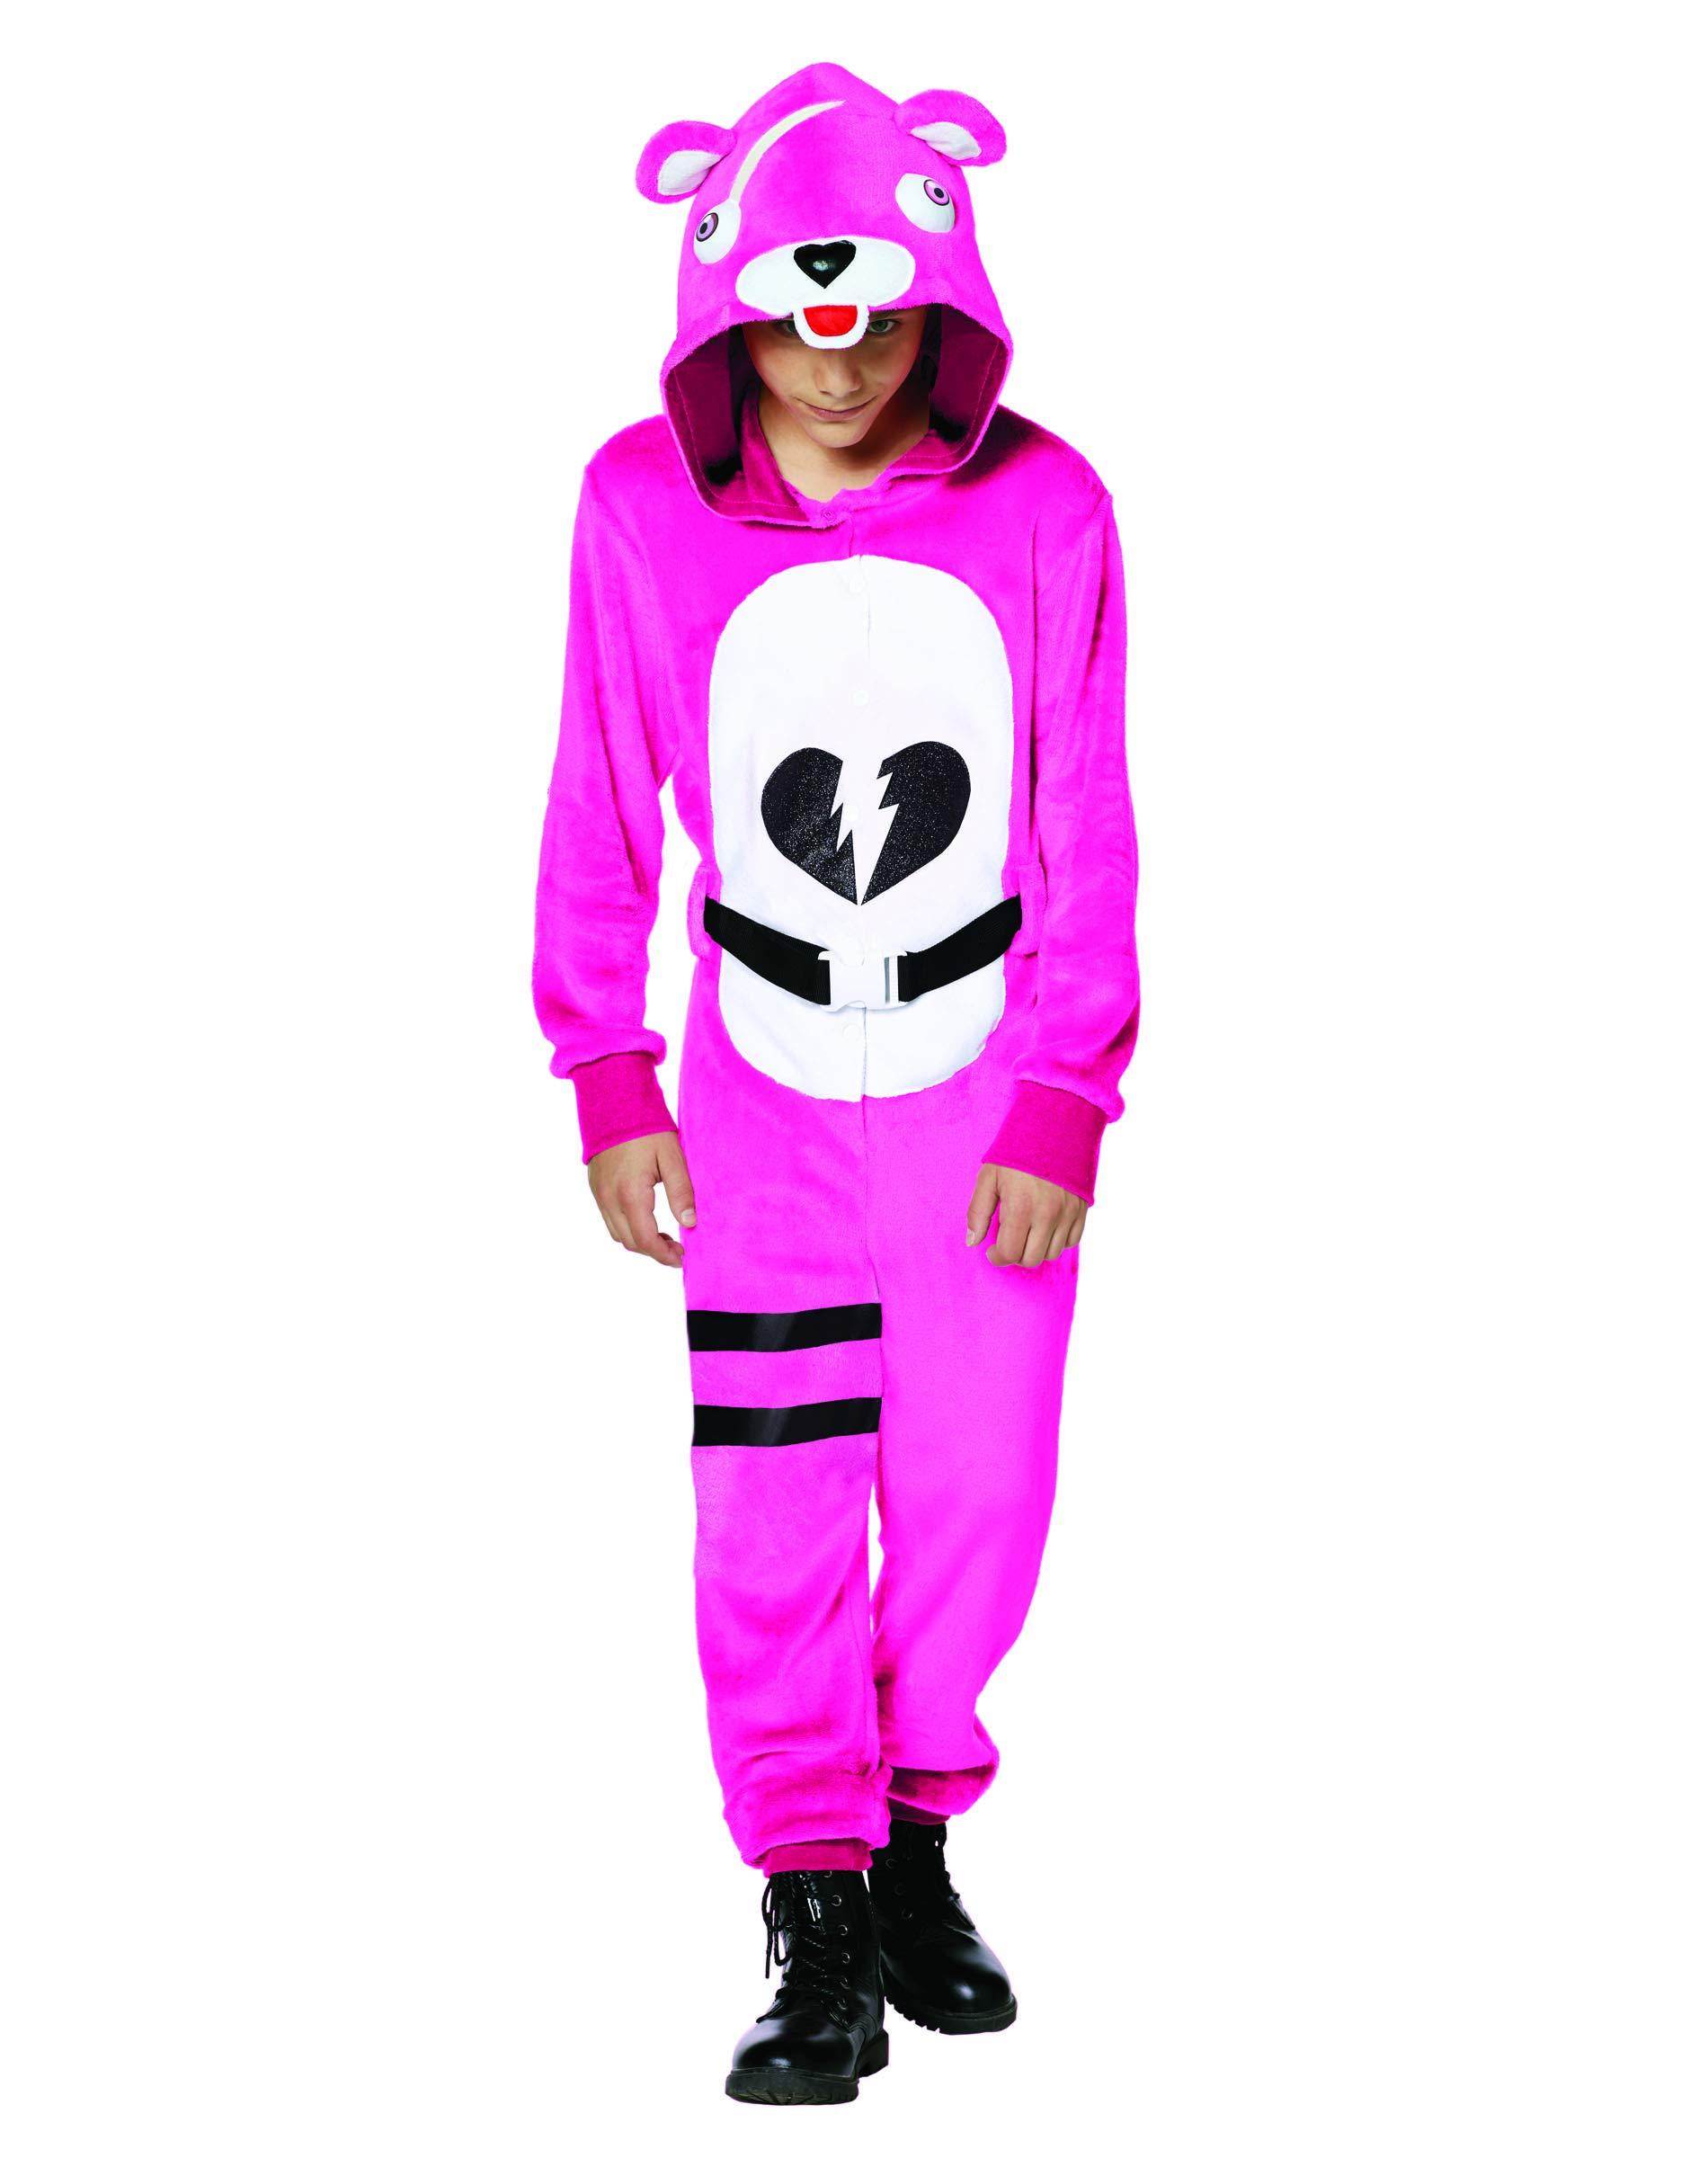 Spirit Halloween Kids Fortnite Plush Cuddle Team Leader Costume by Spirit Halloween (Image #2)